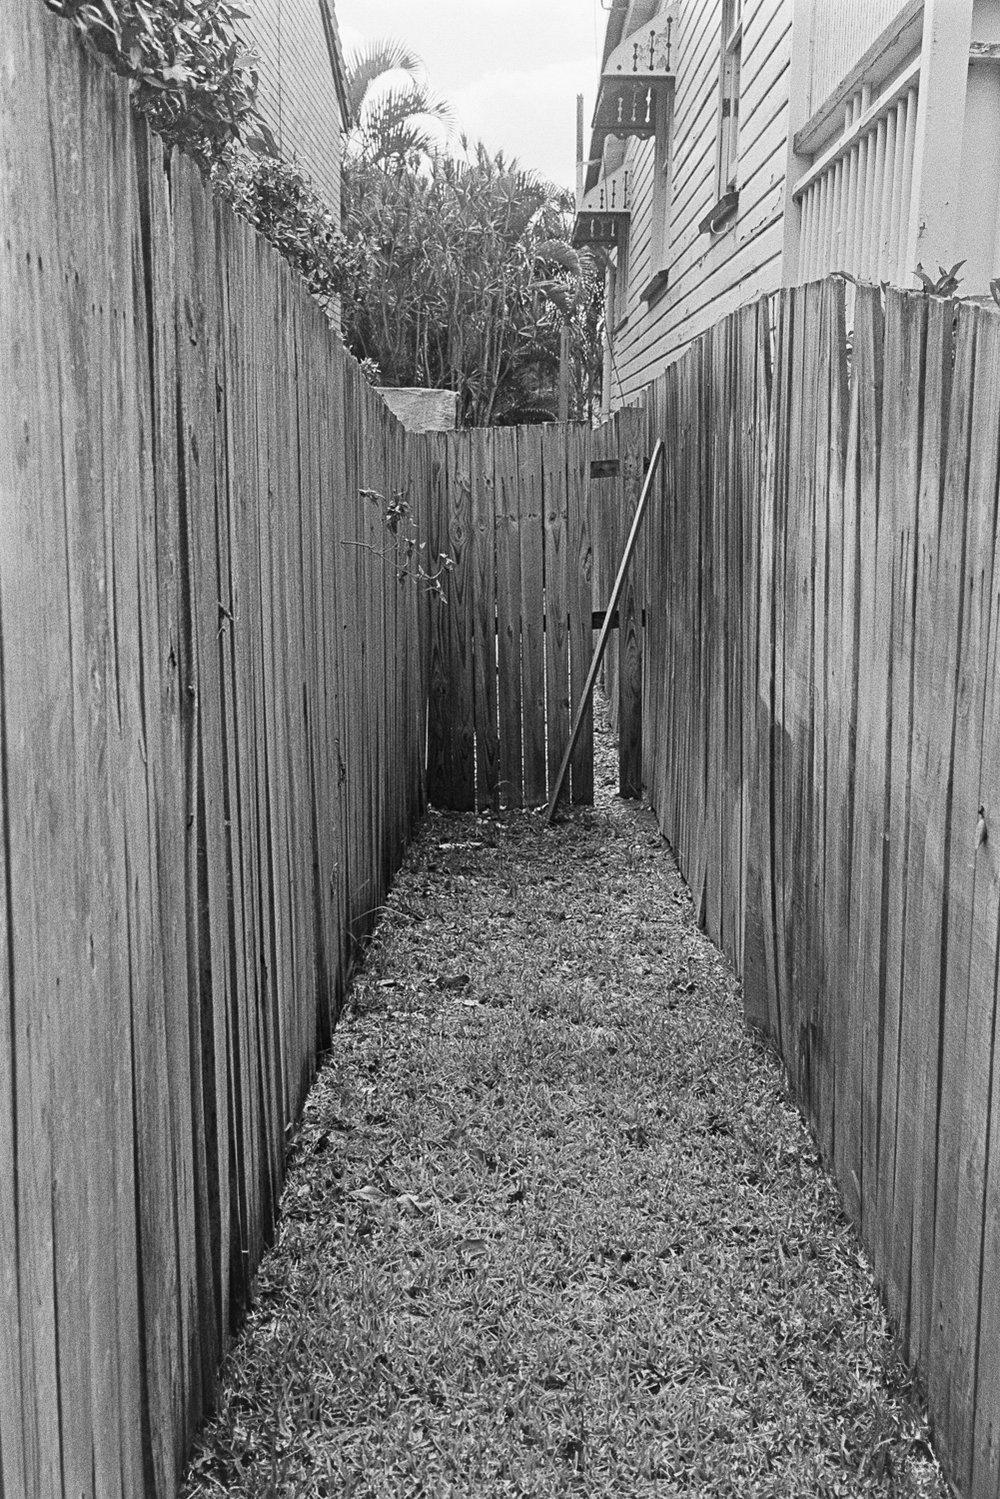 20190105 - Roll 269 - 018-Nick-Bedford,-Photographer-Black and White, Brisbane, Kodak TRI-X 400, Leica M7, Street Photography, Voigtlander 35mm F1.7.jpg